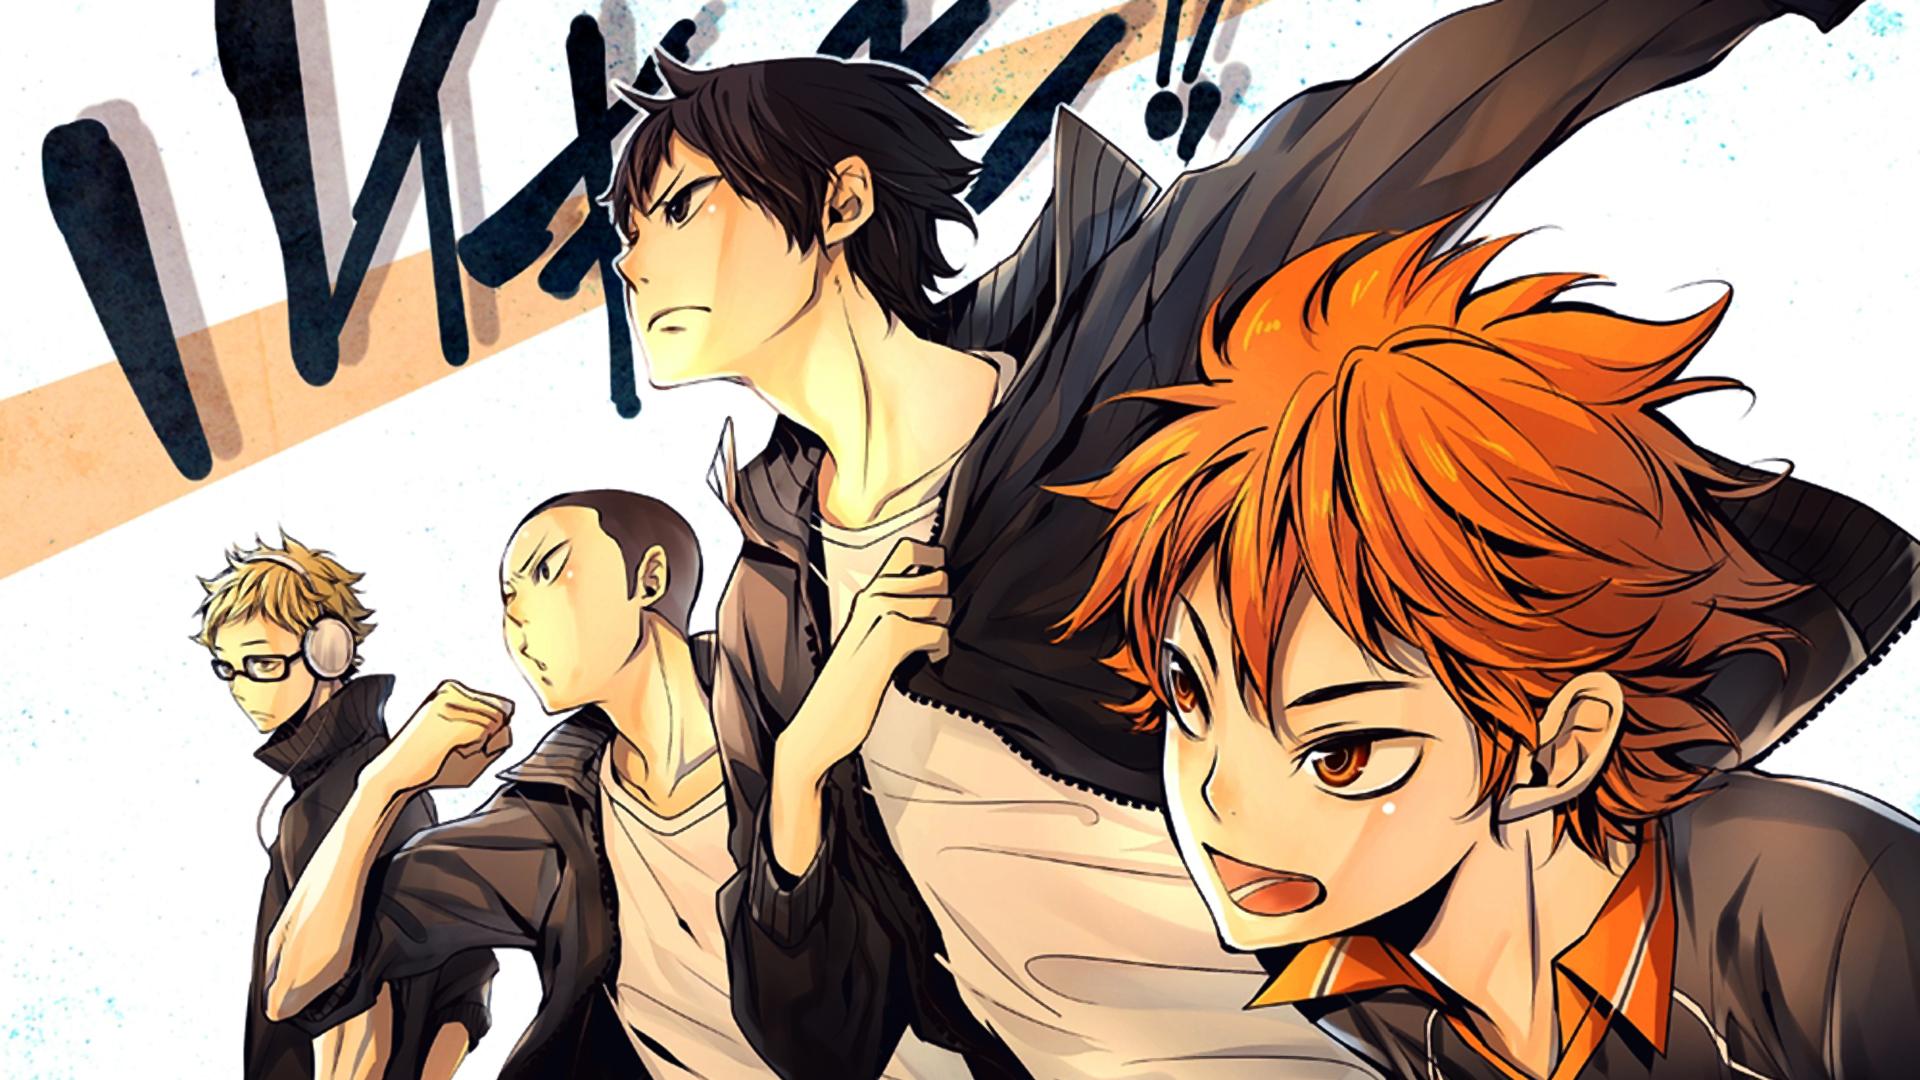 Haikyuu Anime 1920x1080 Wallpaper HD